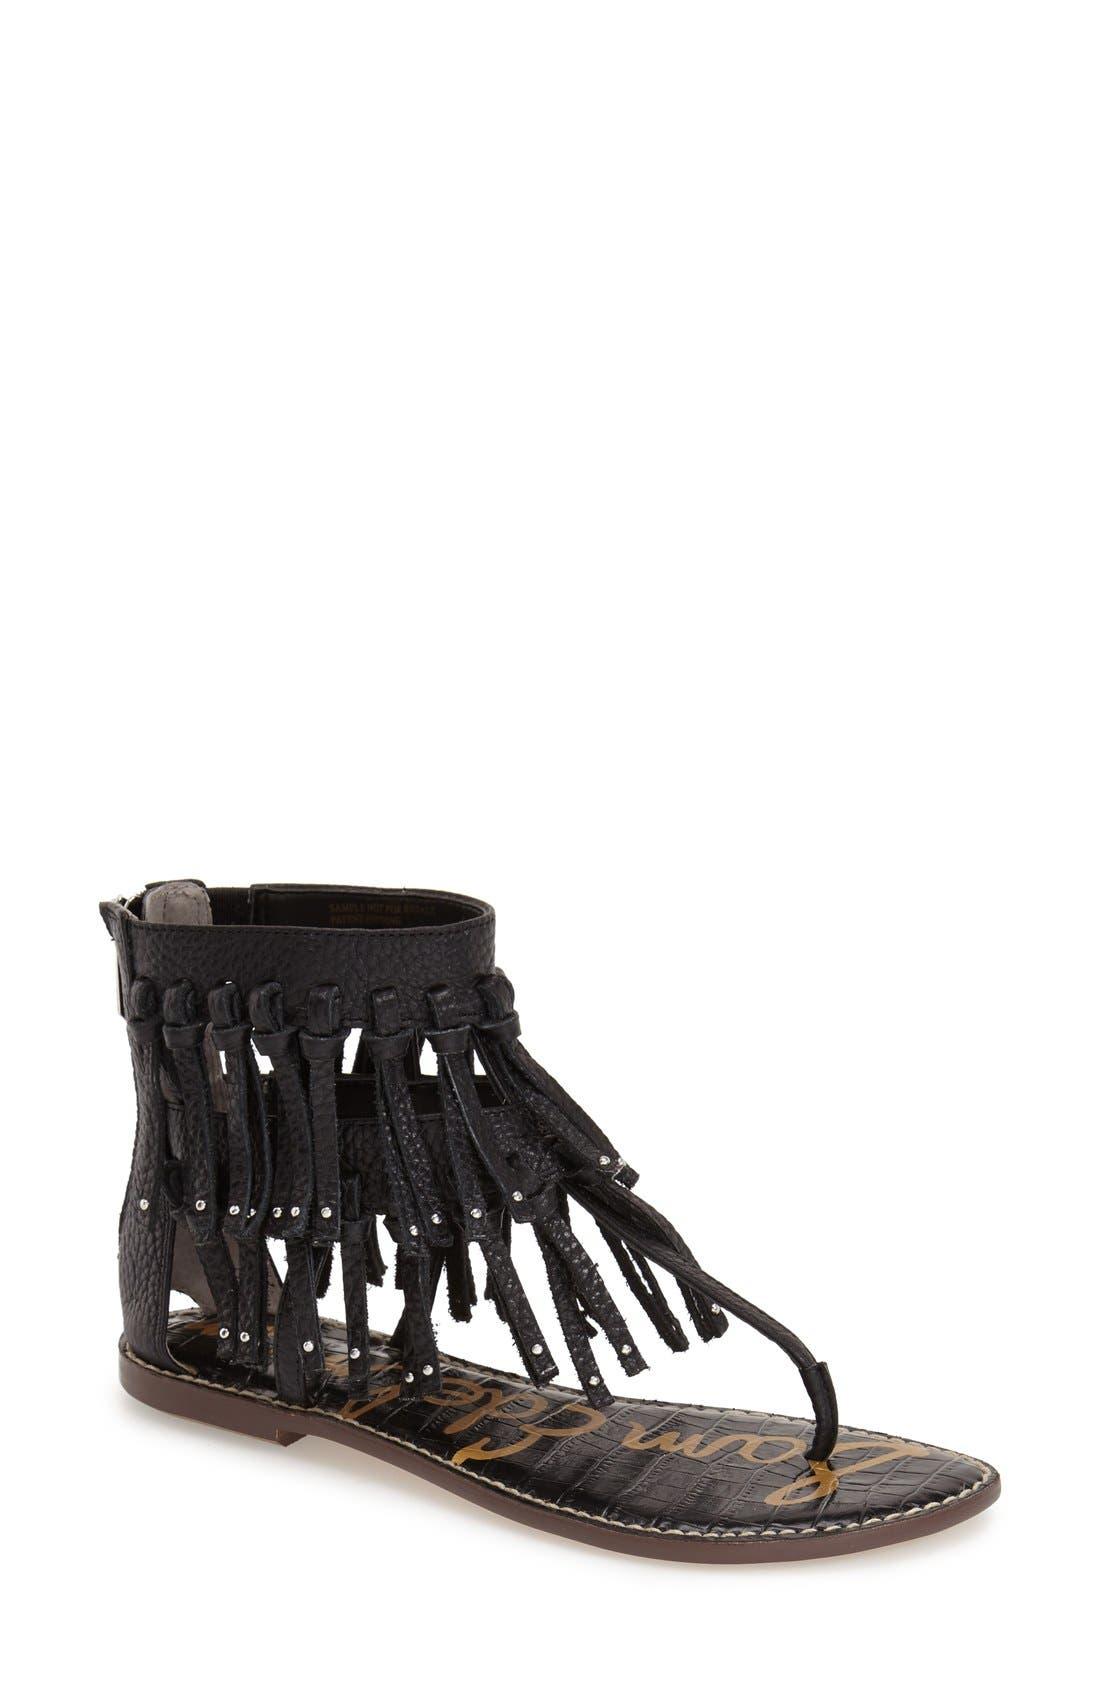 'Griffen' Fringe Sandal,                         Main,                         color, 001